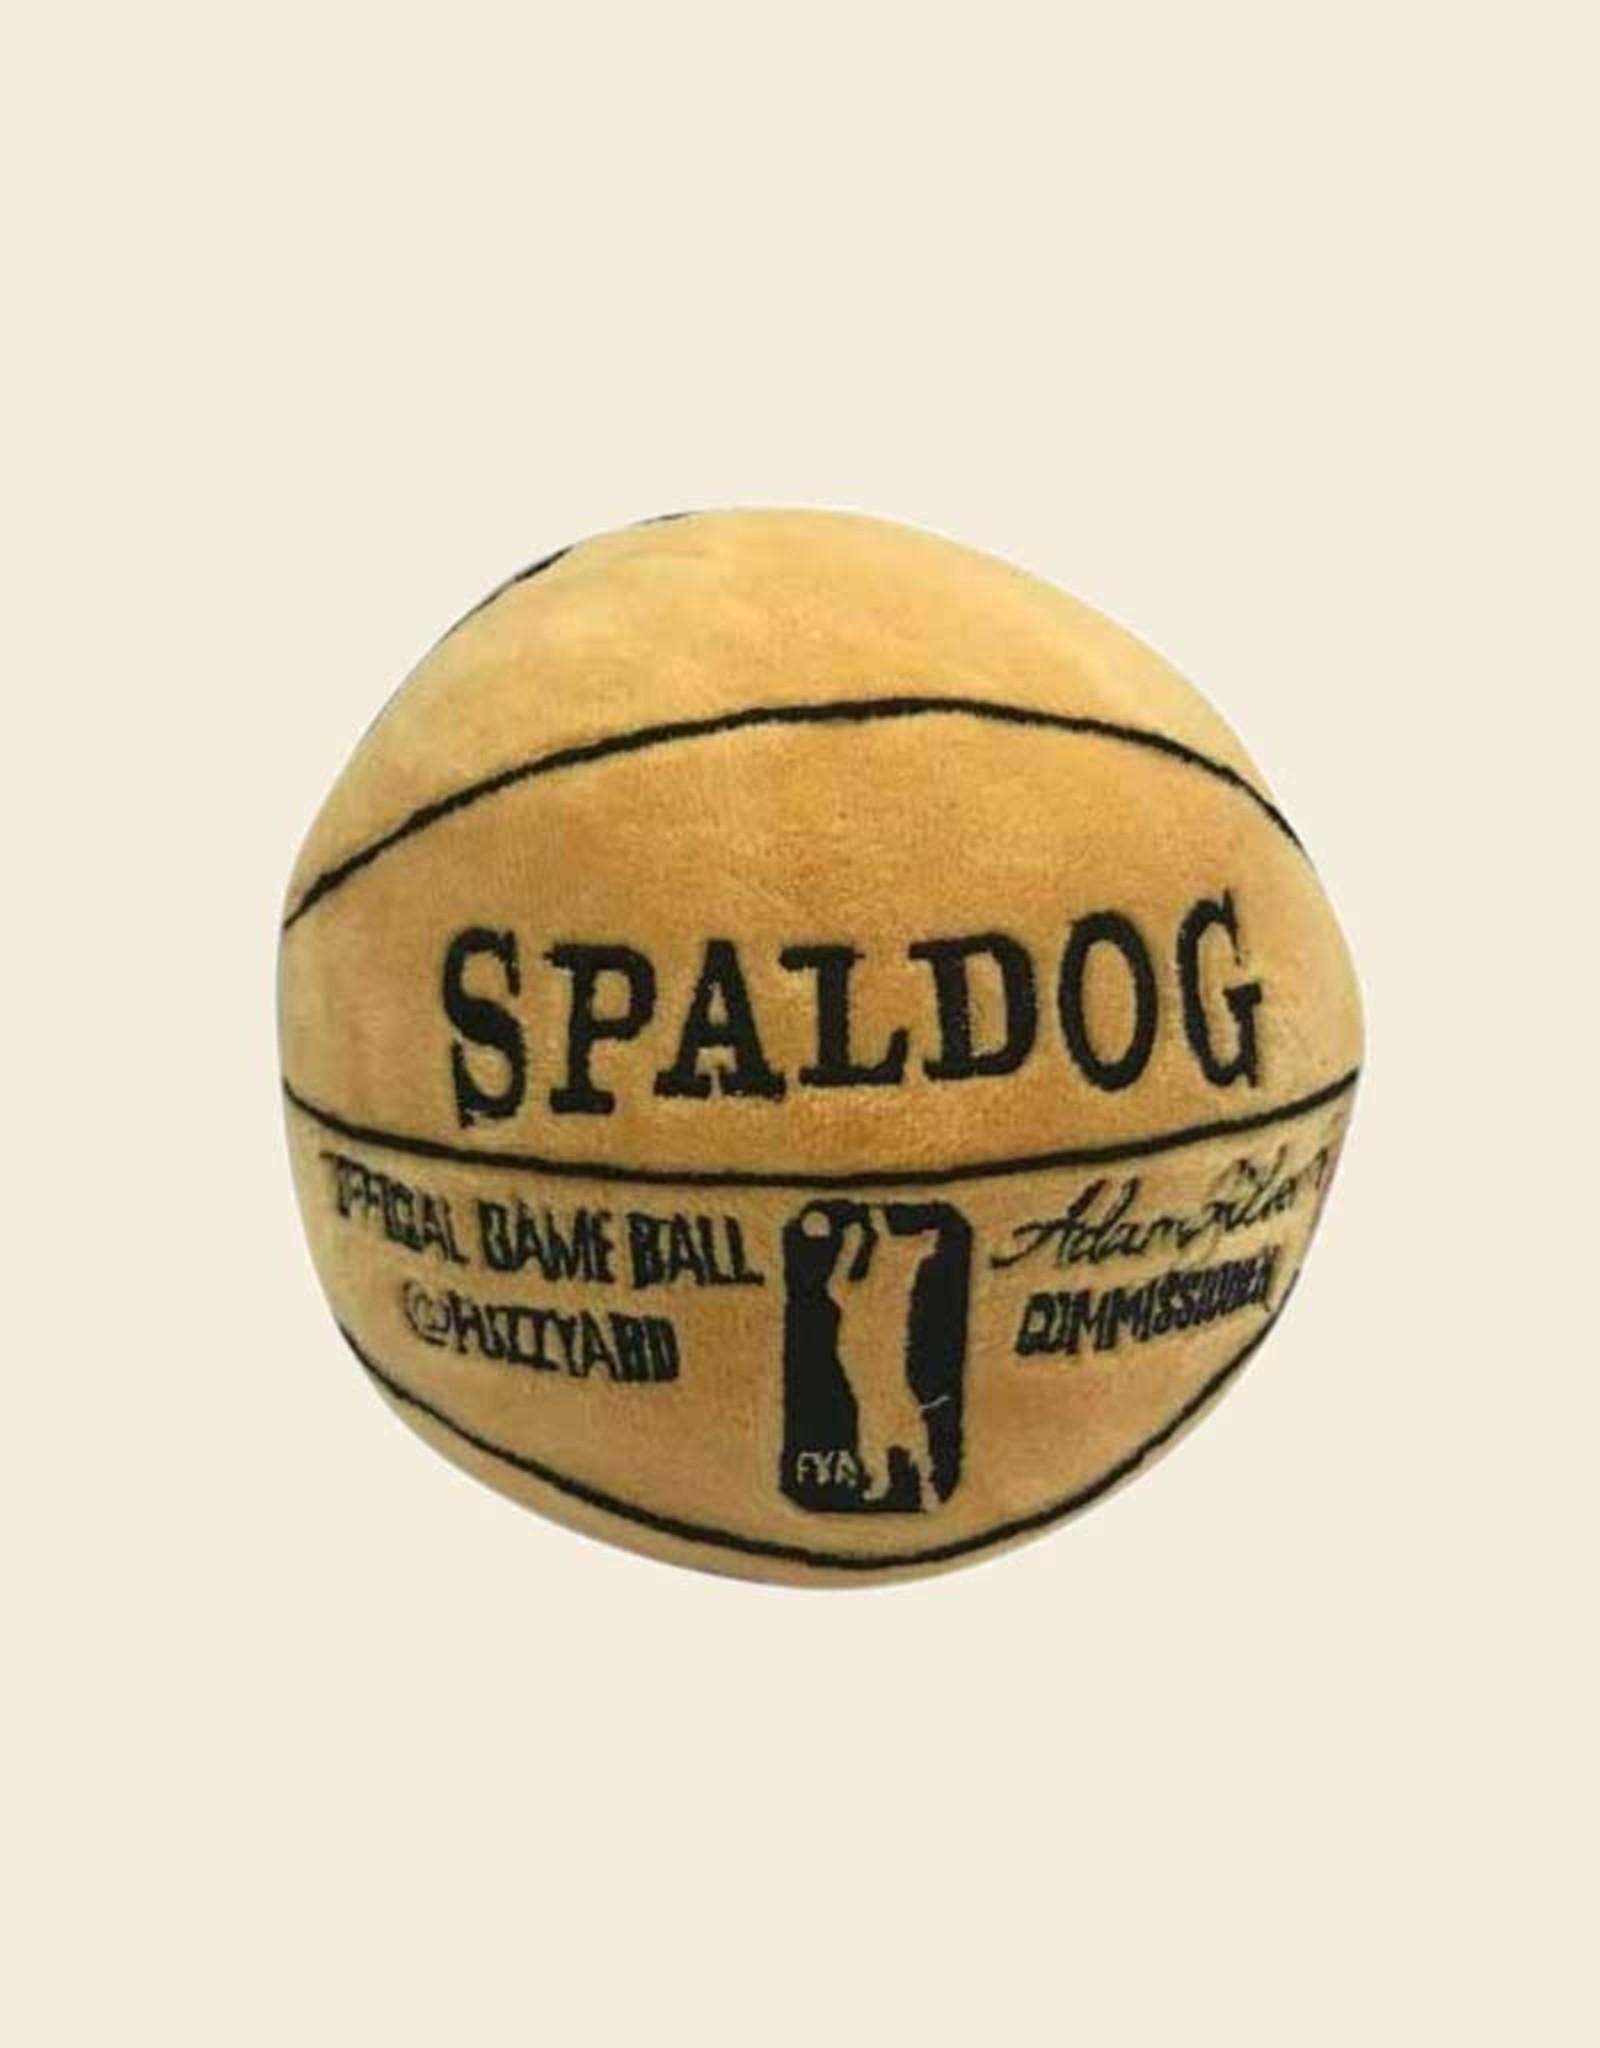 Spaldog Plush Basketball